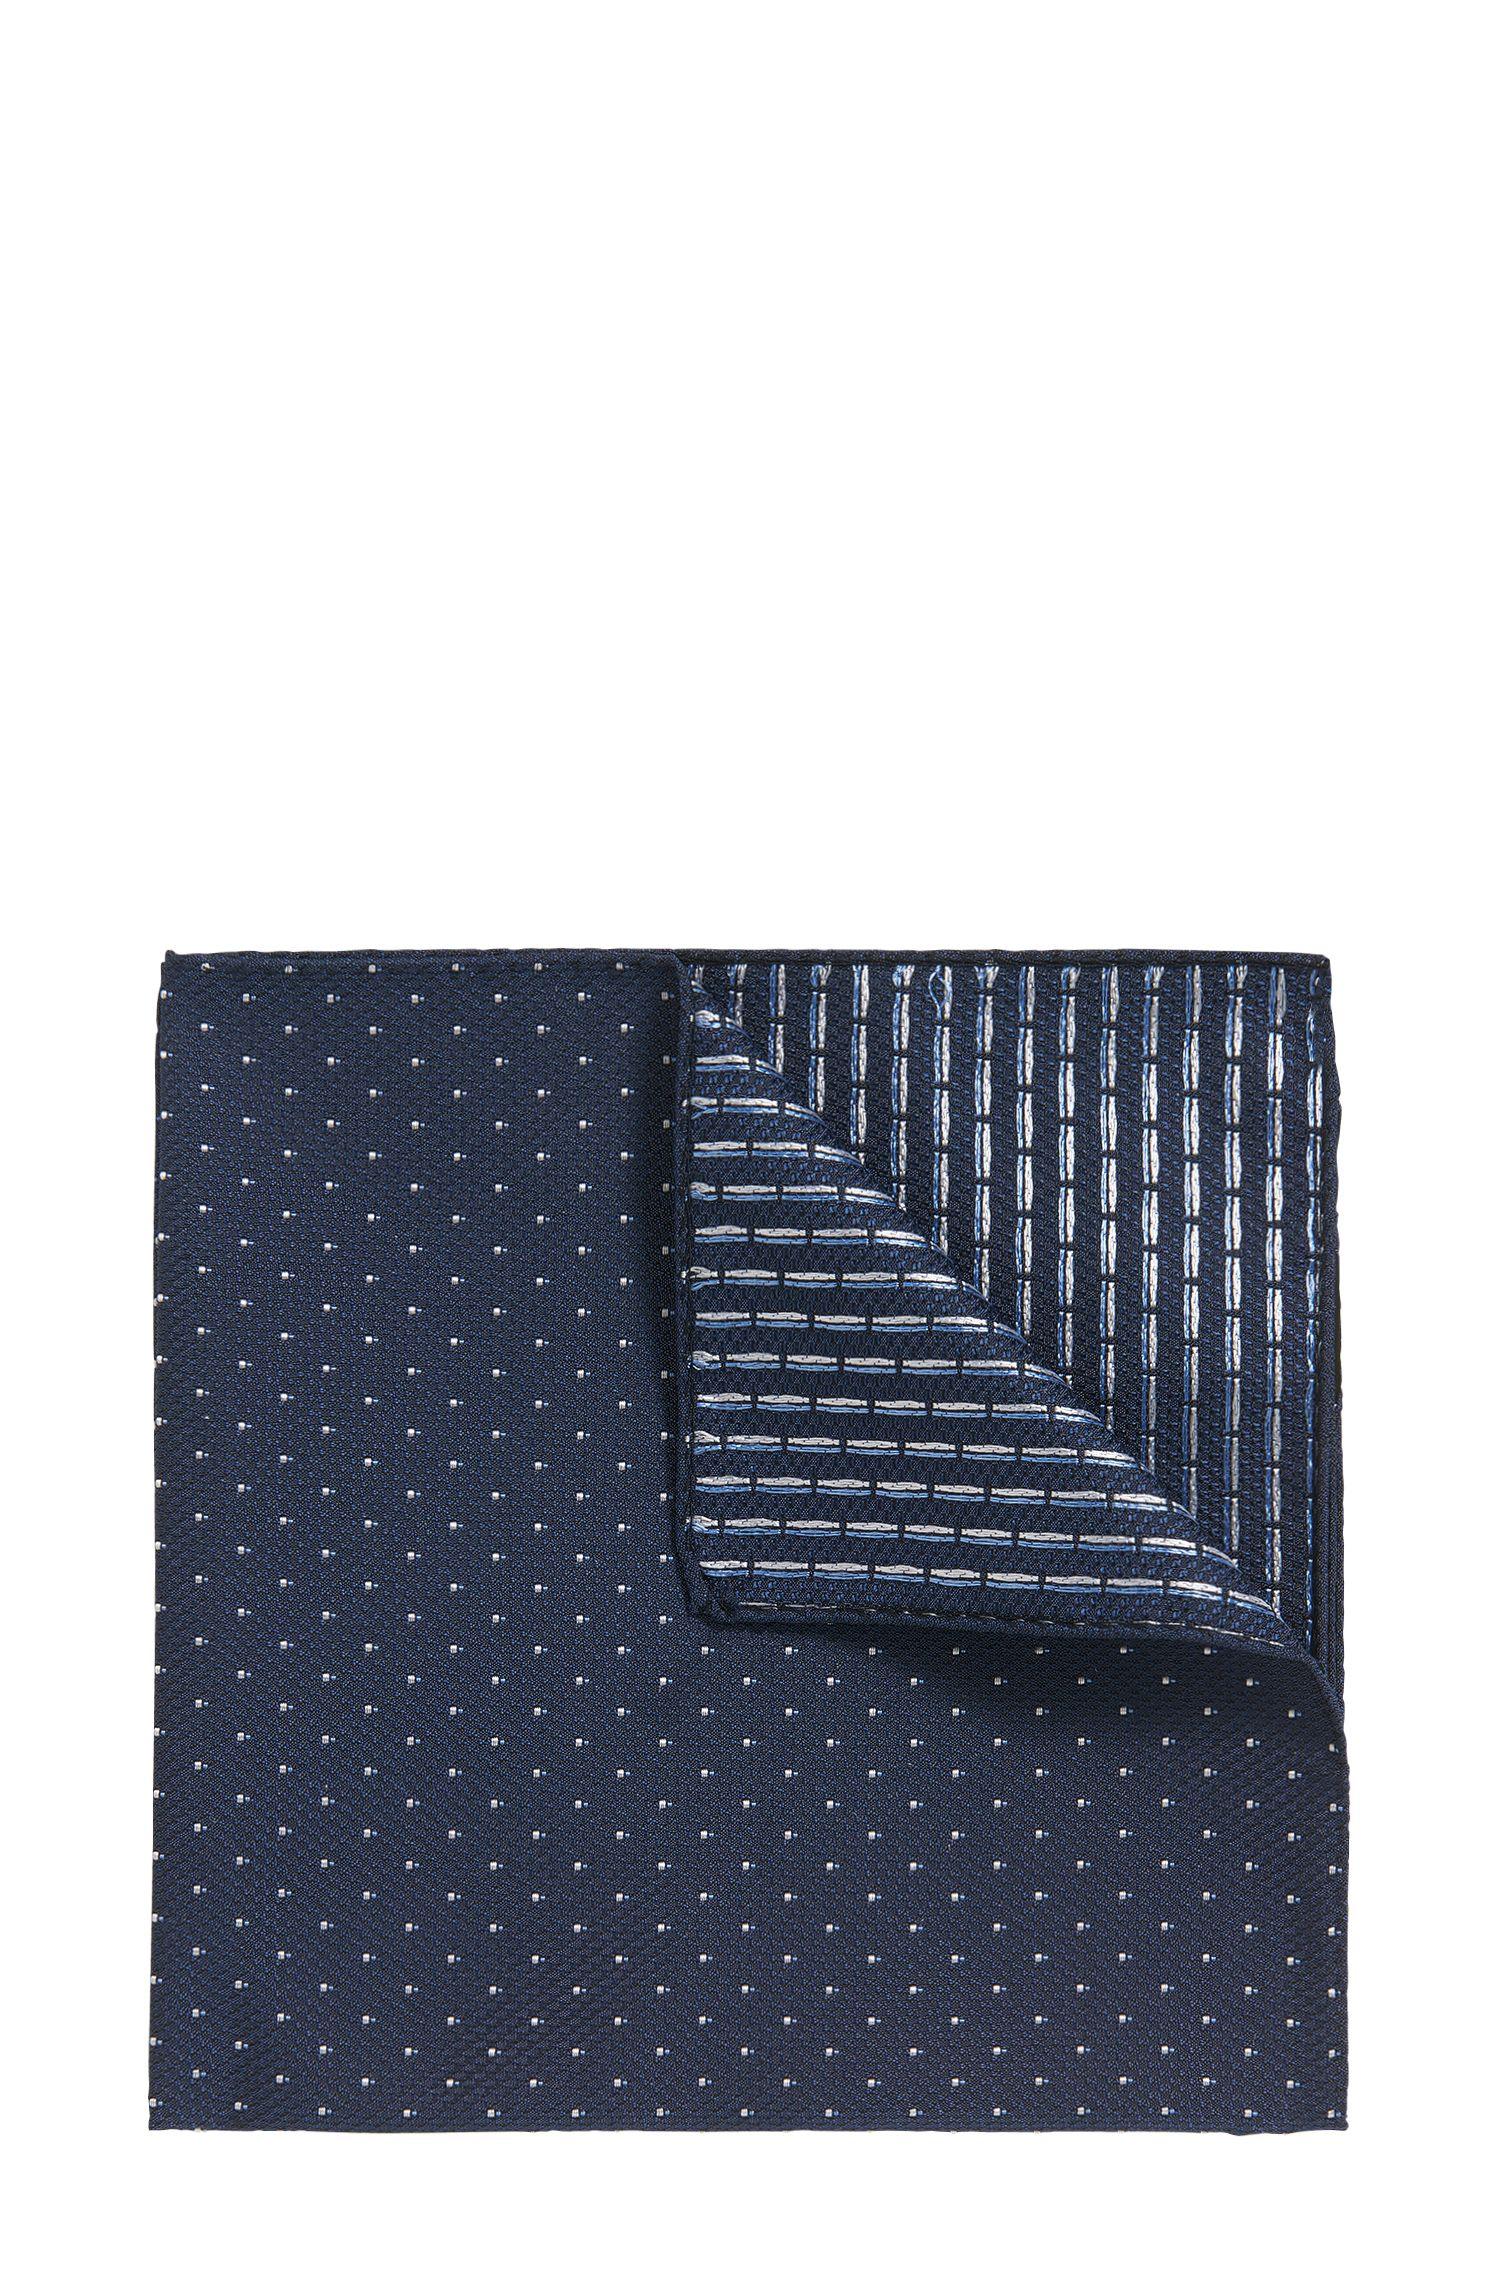 Pañuelo de bolsillo reversible en jacquard de seda con microestampado